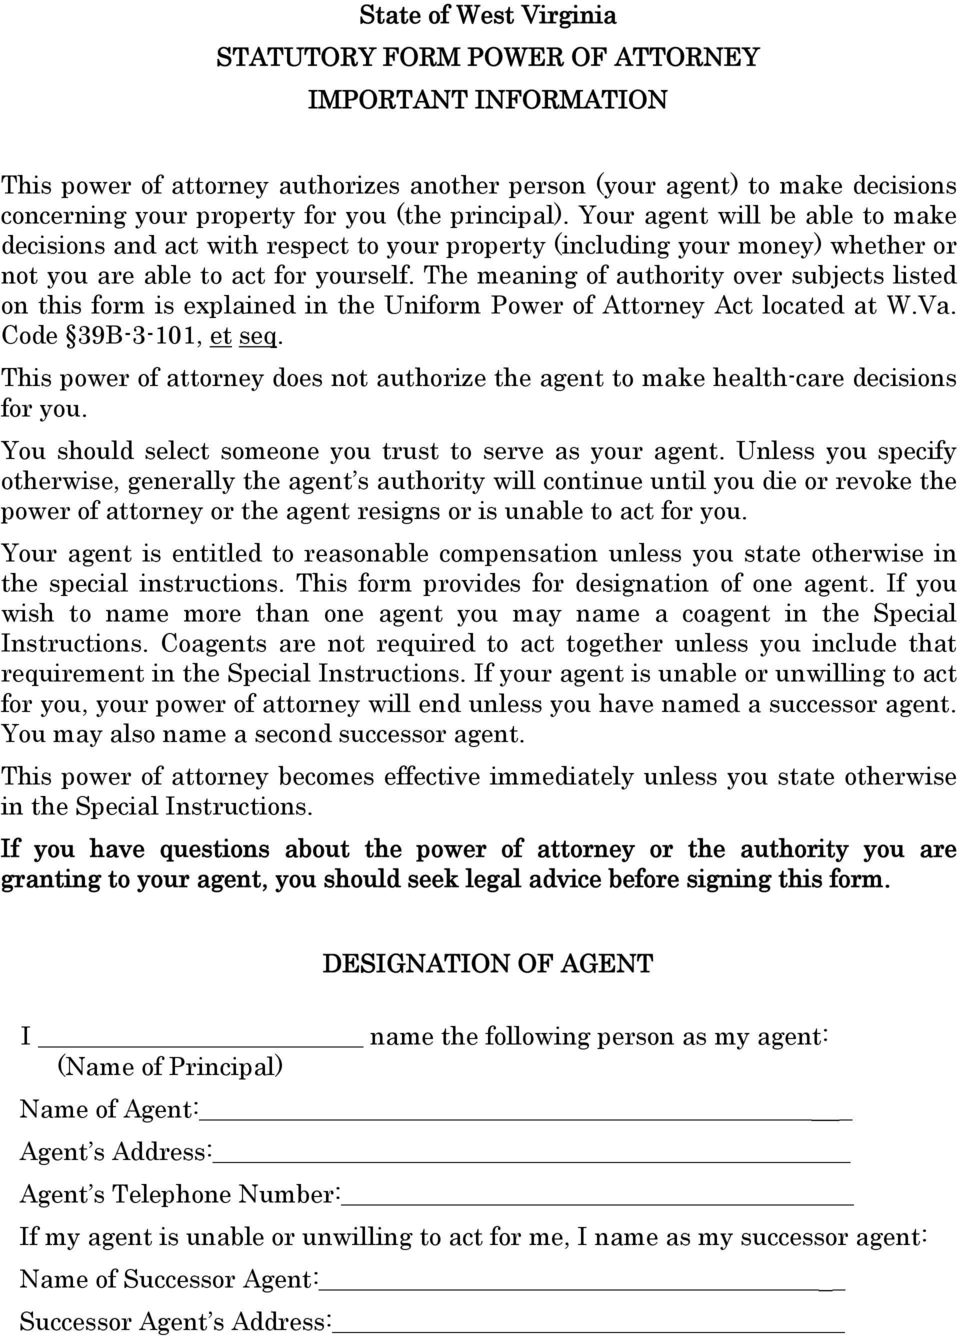 Wv Uniform Power Of Attorney Form